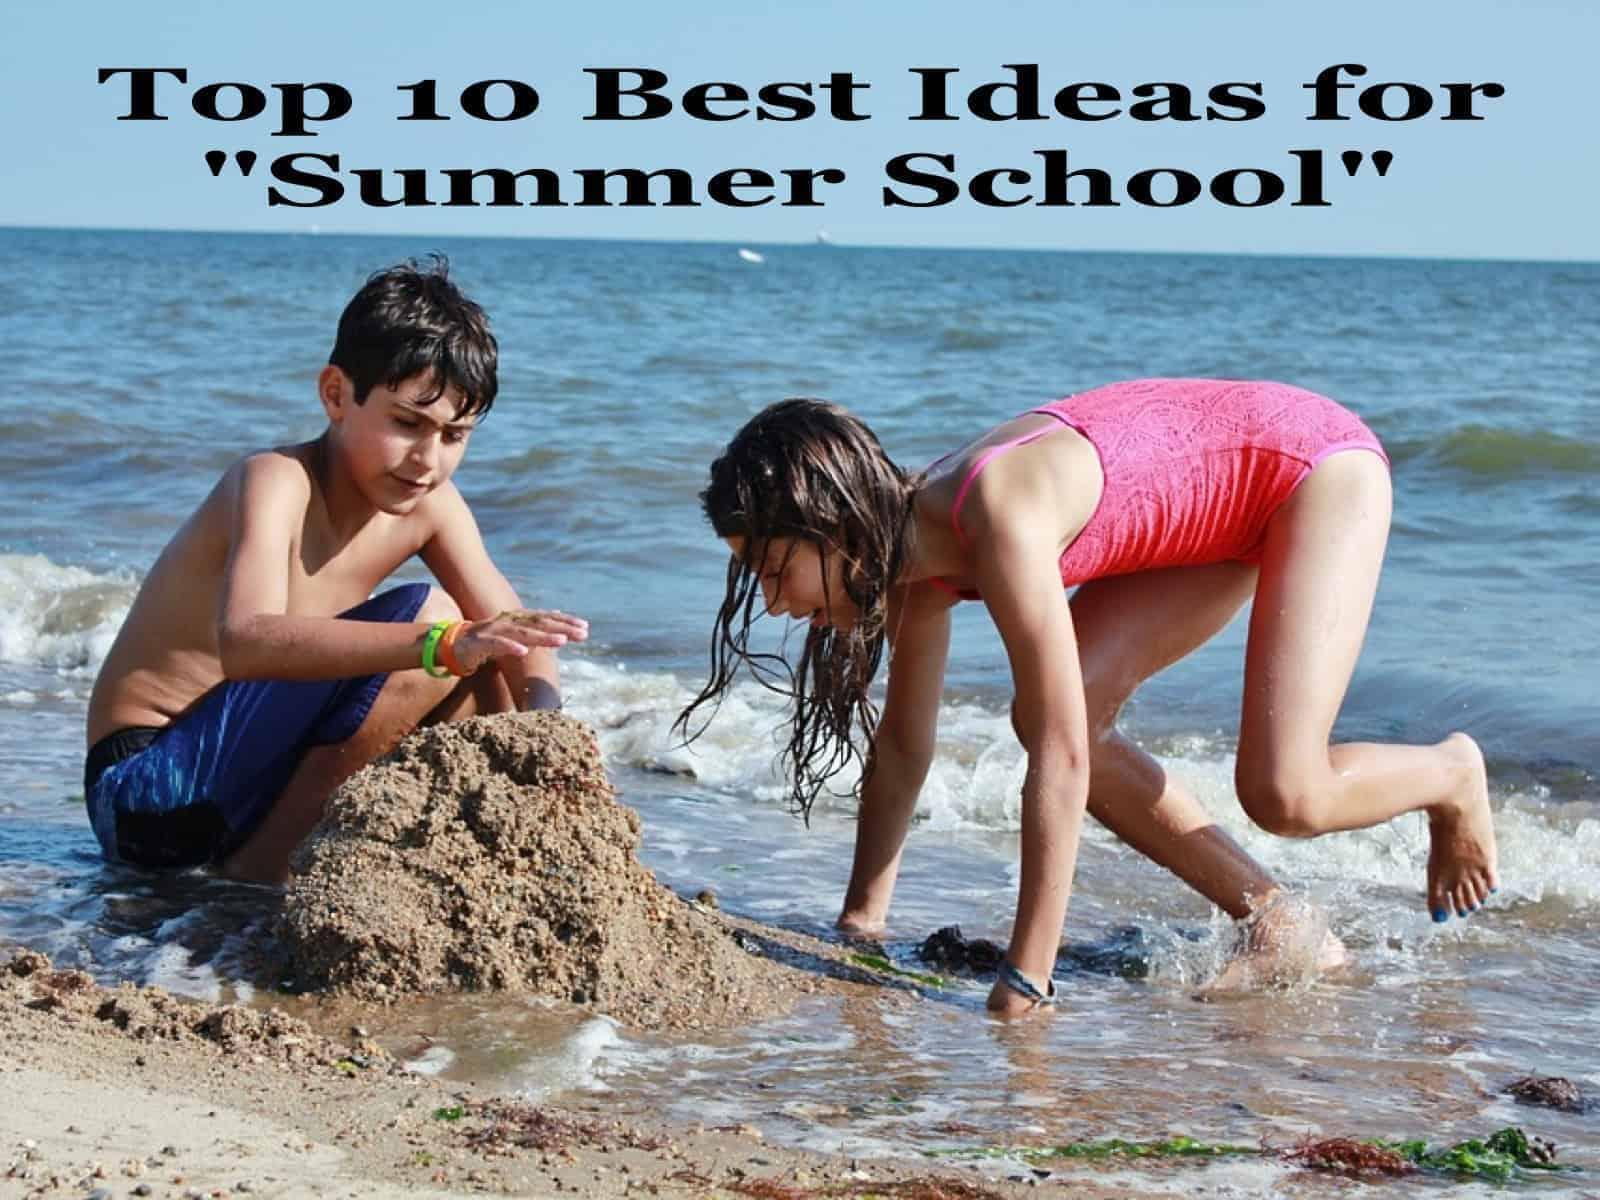 Fun Summer School Ideas